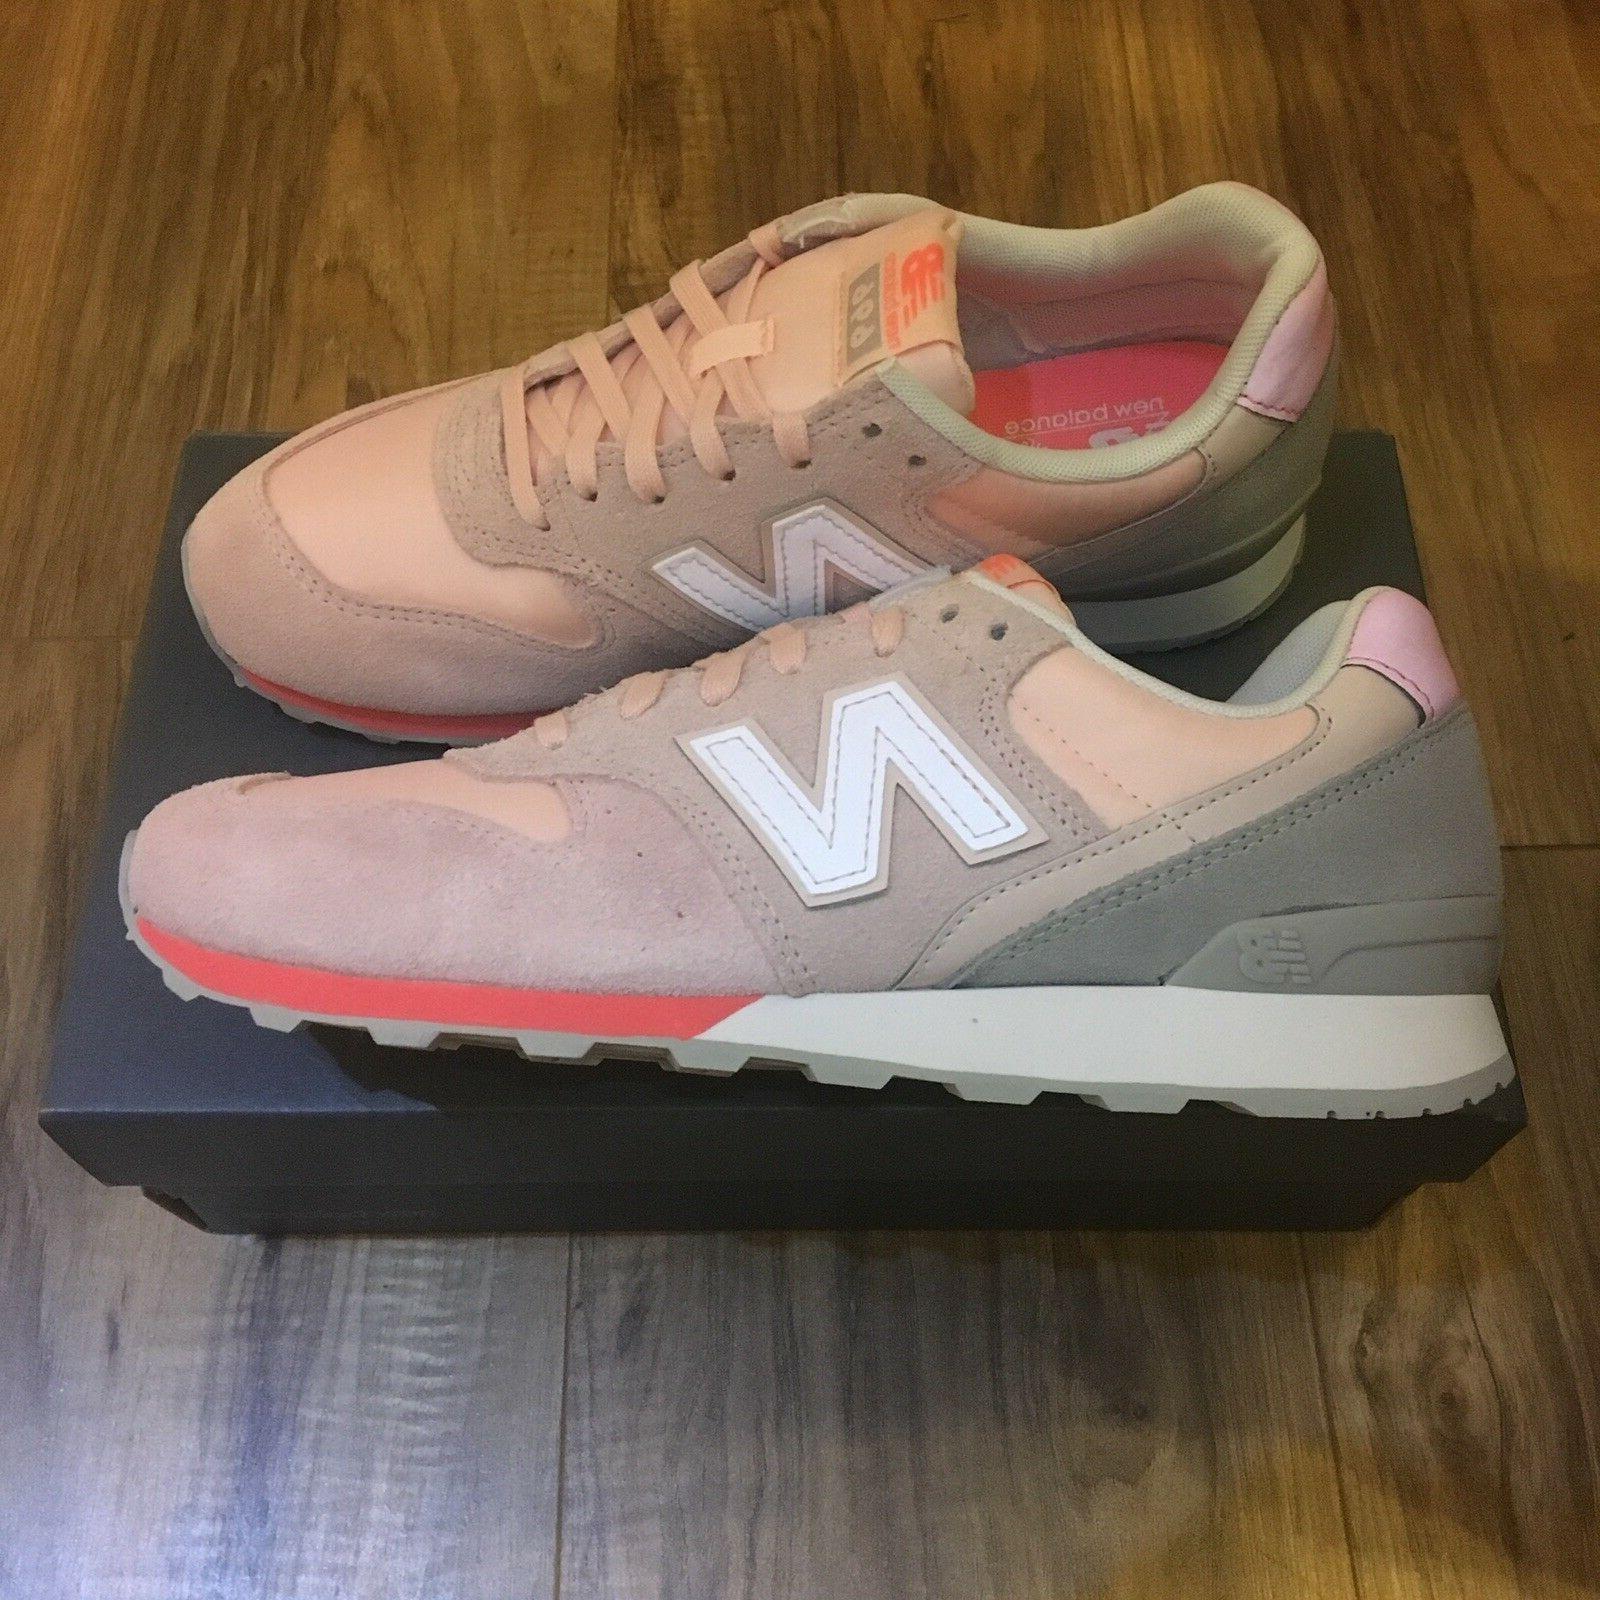 NEW BALANCE WL696STG Classics Lifestyle Retro Sneakers Coral